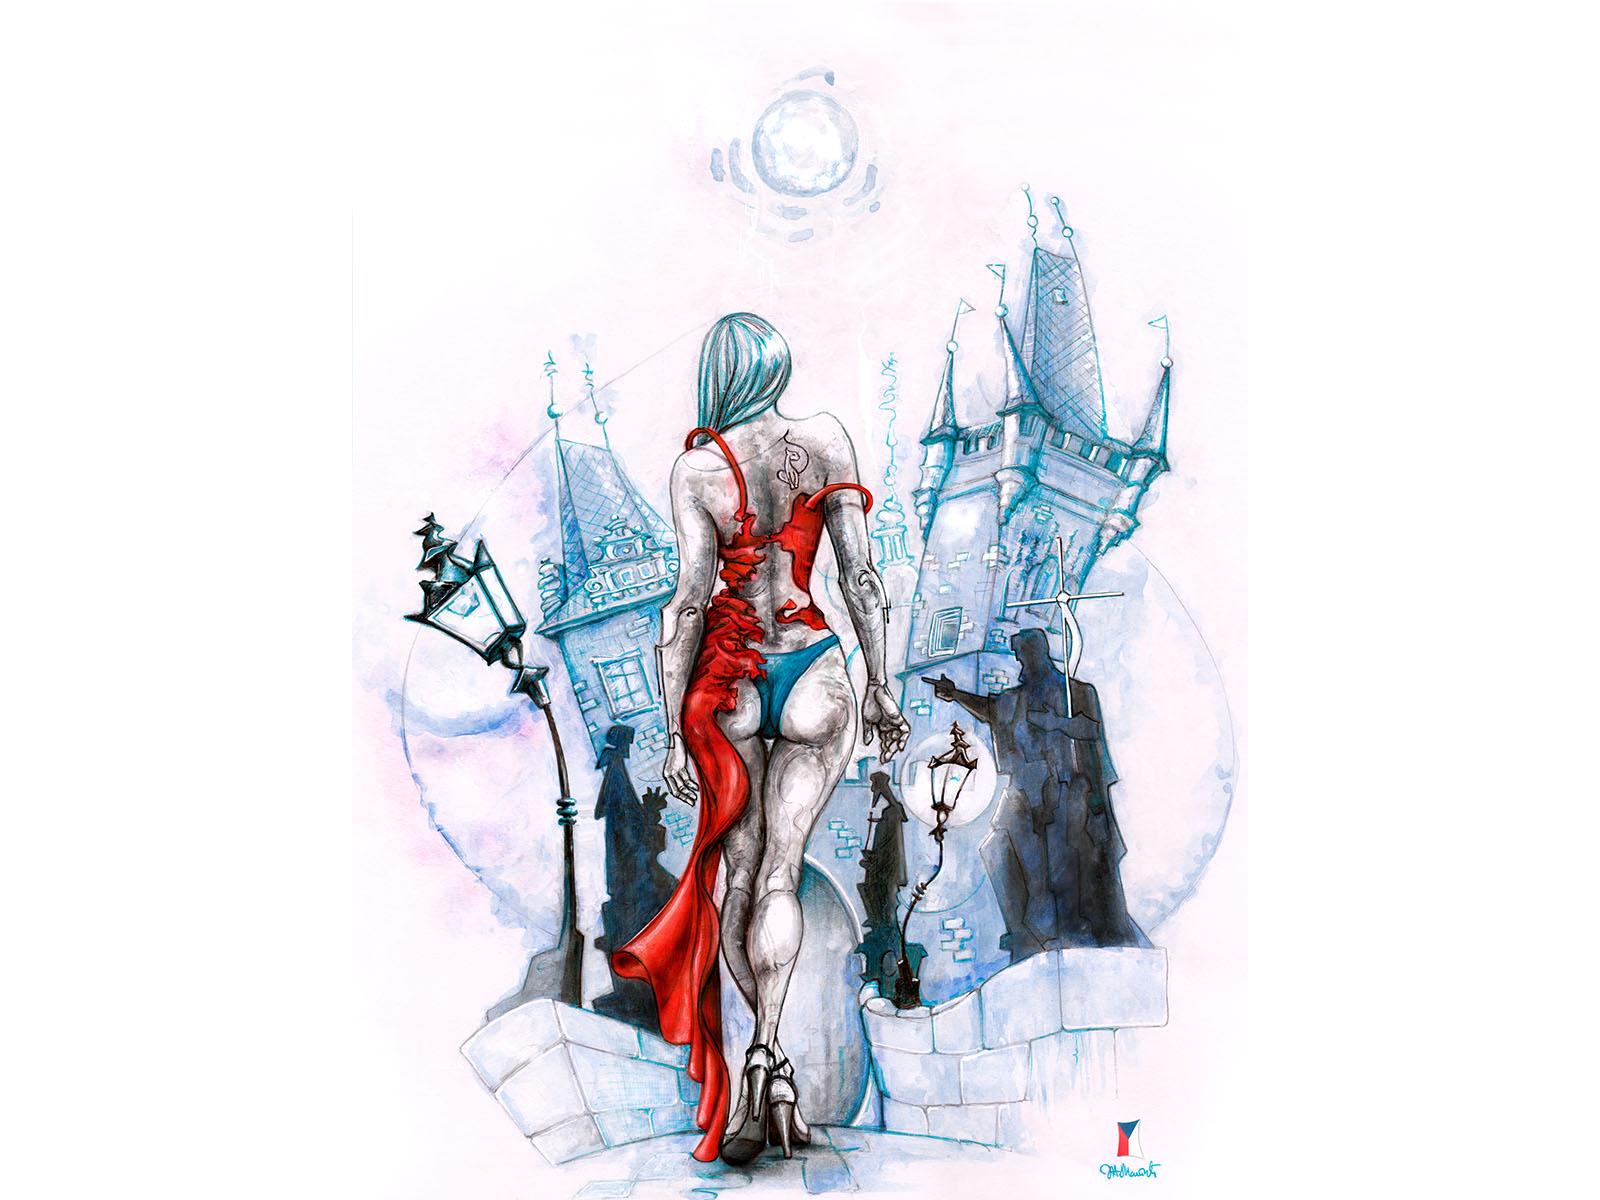 Red dress by zharko